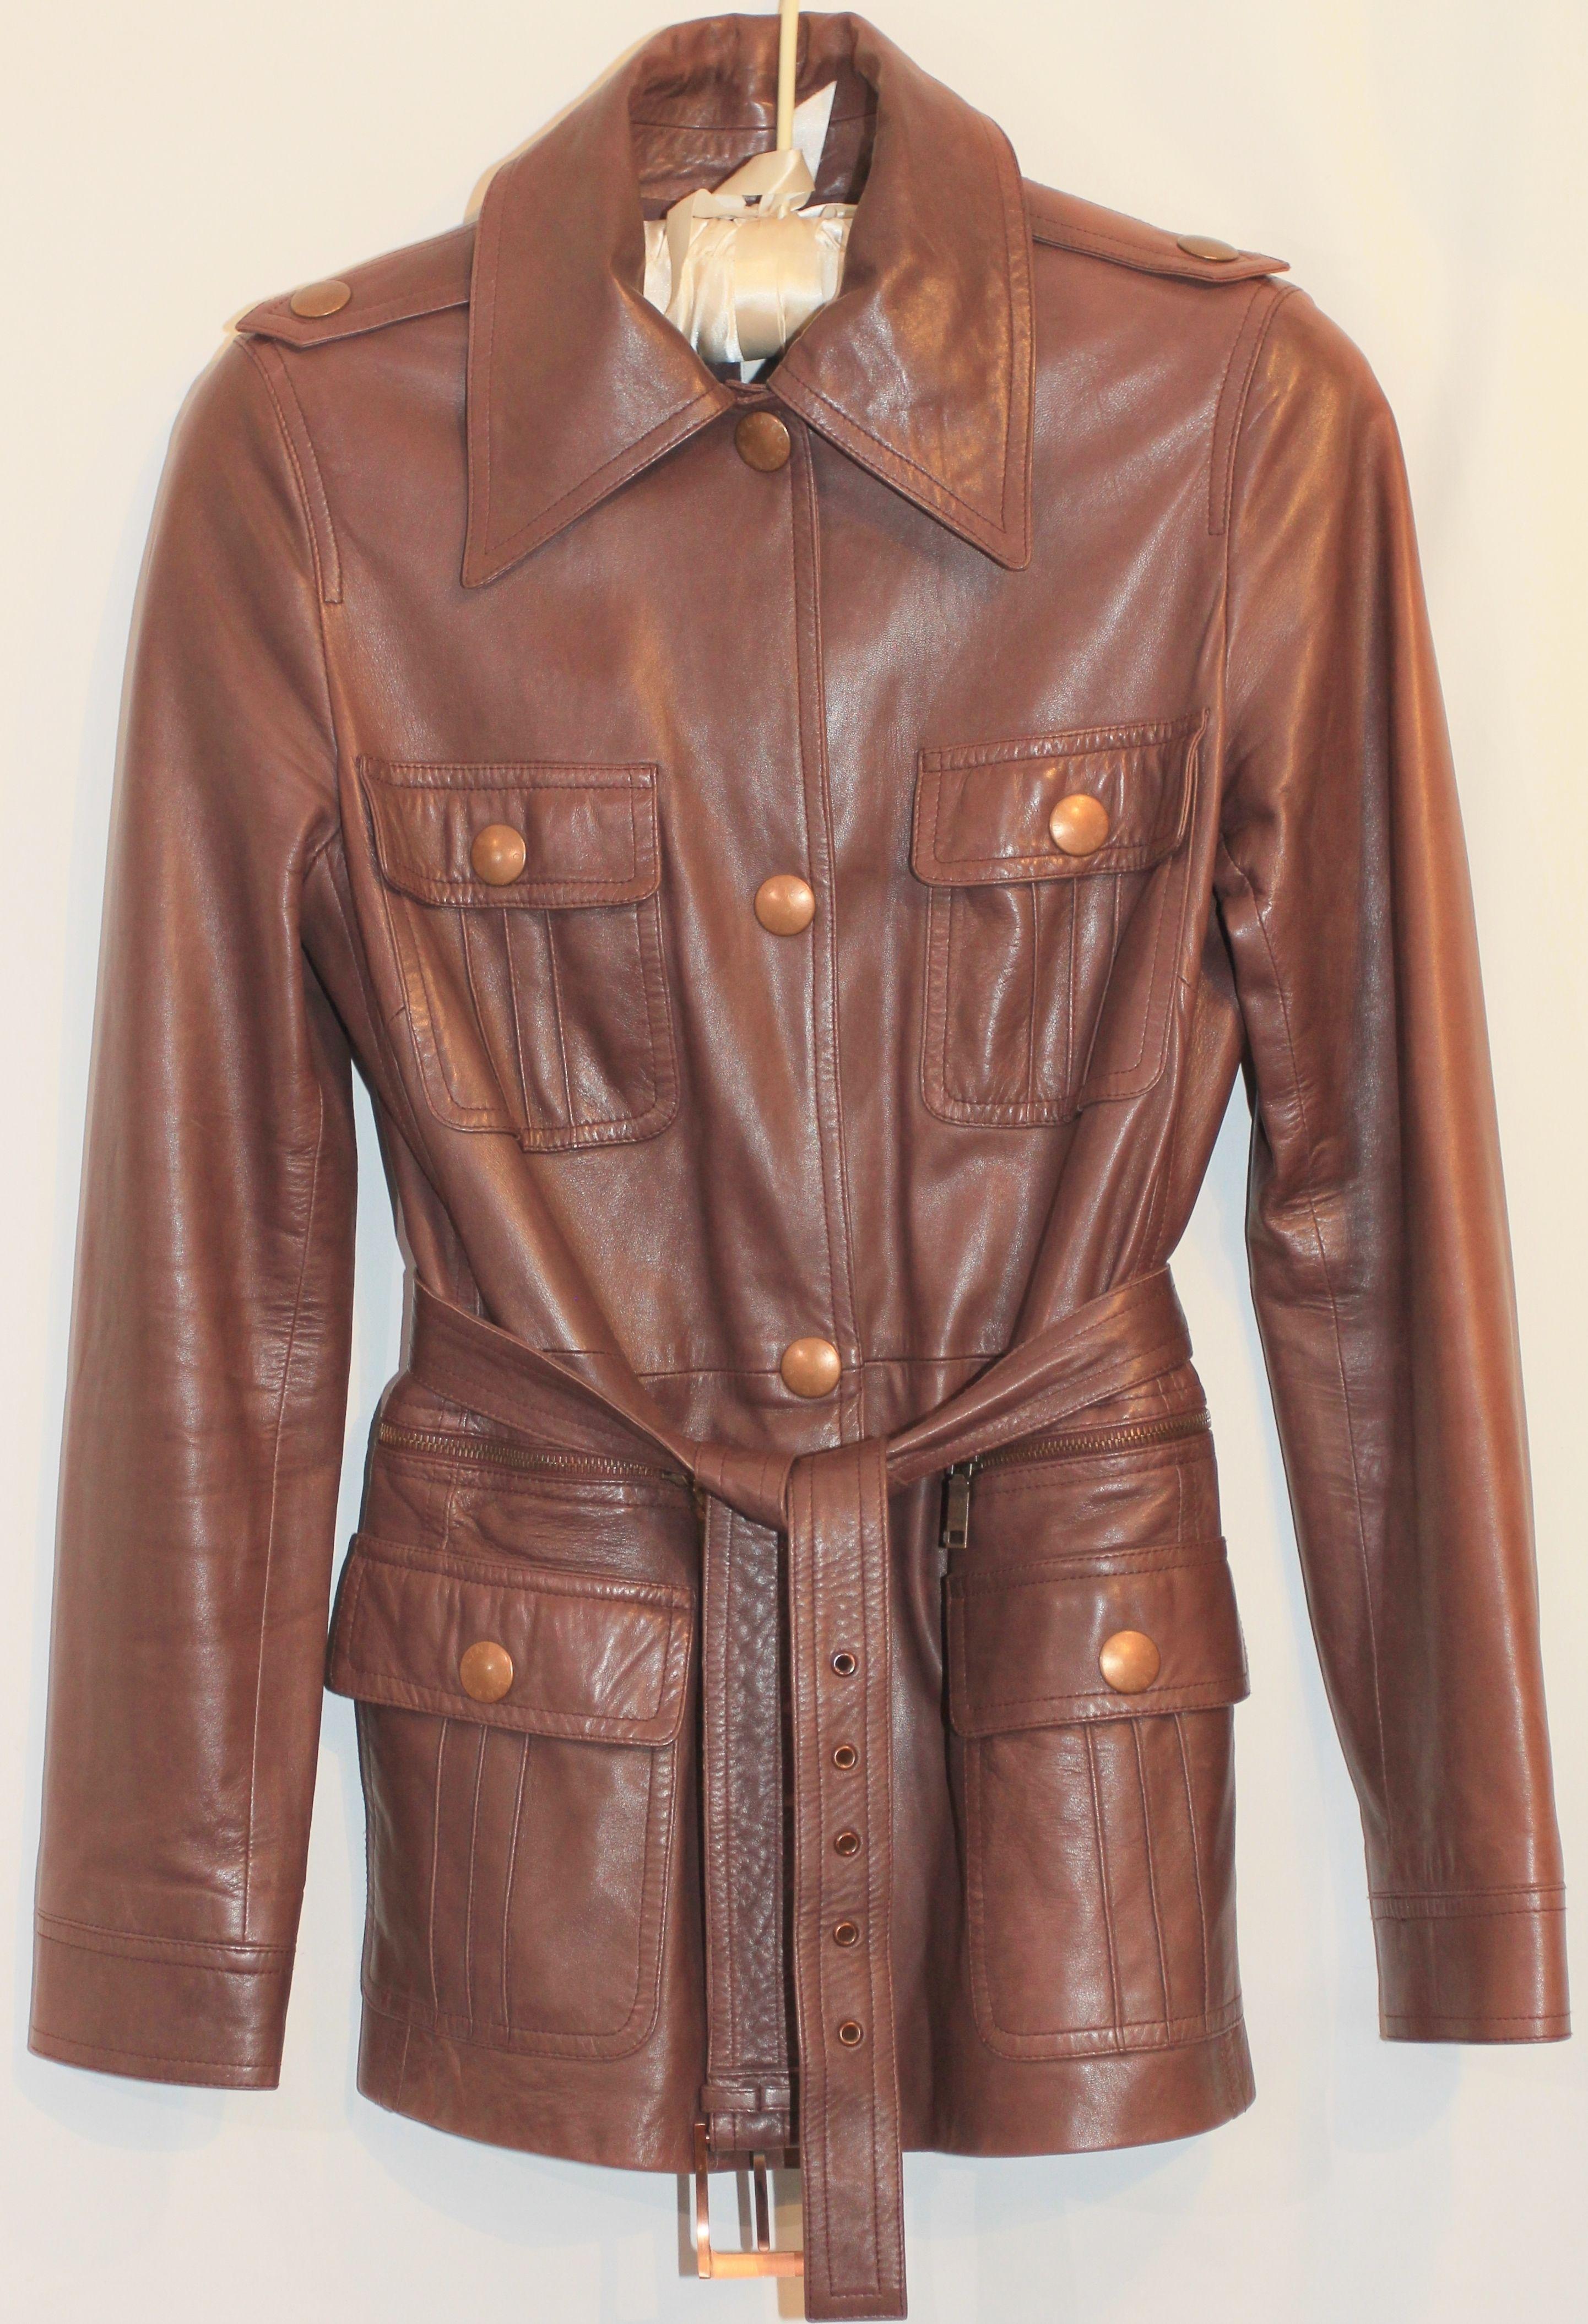 Céline Safari Jacket Size 4 (S) 96 off retail Burgundy